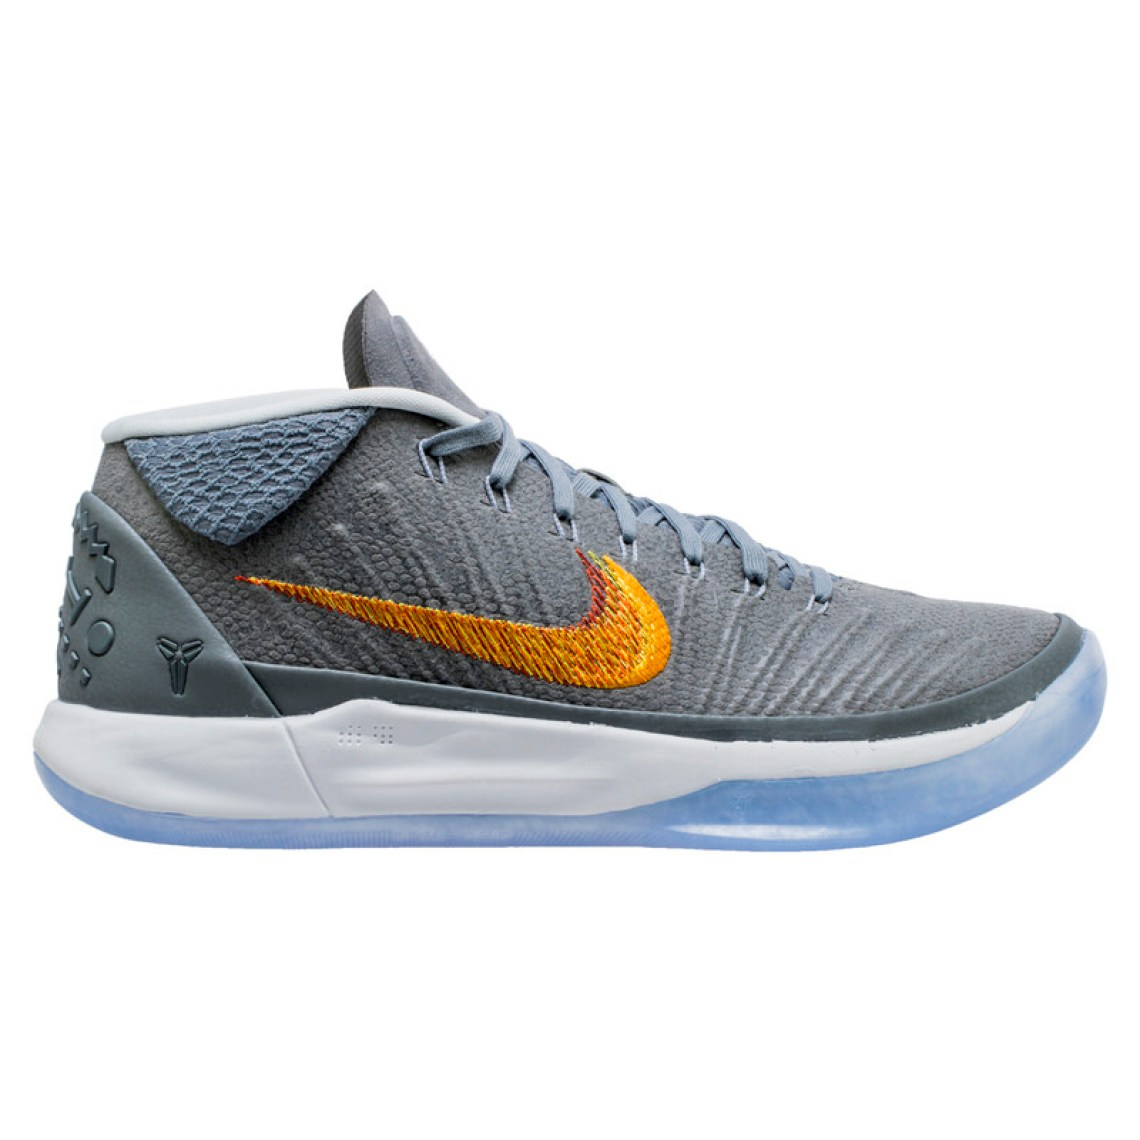 new concept e84db 9805a ... Nike Kobe A.D.